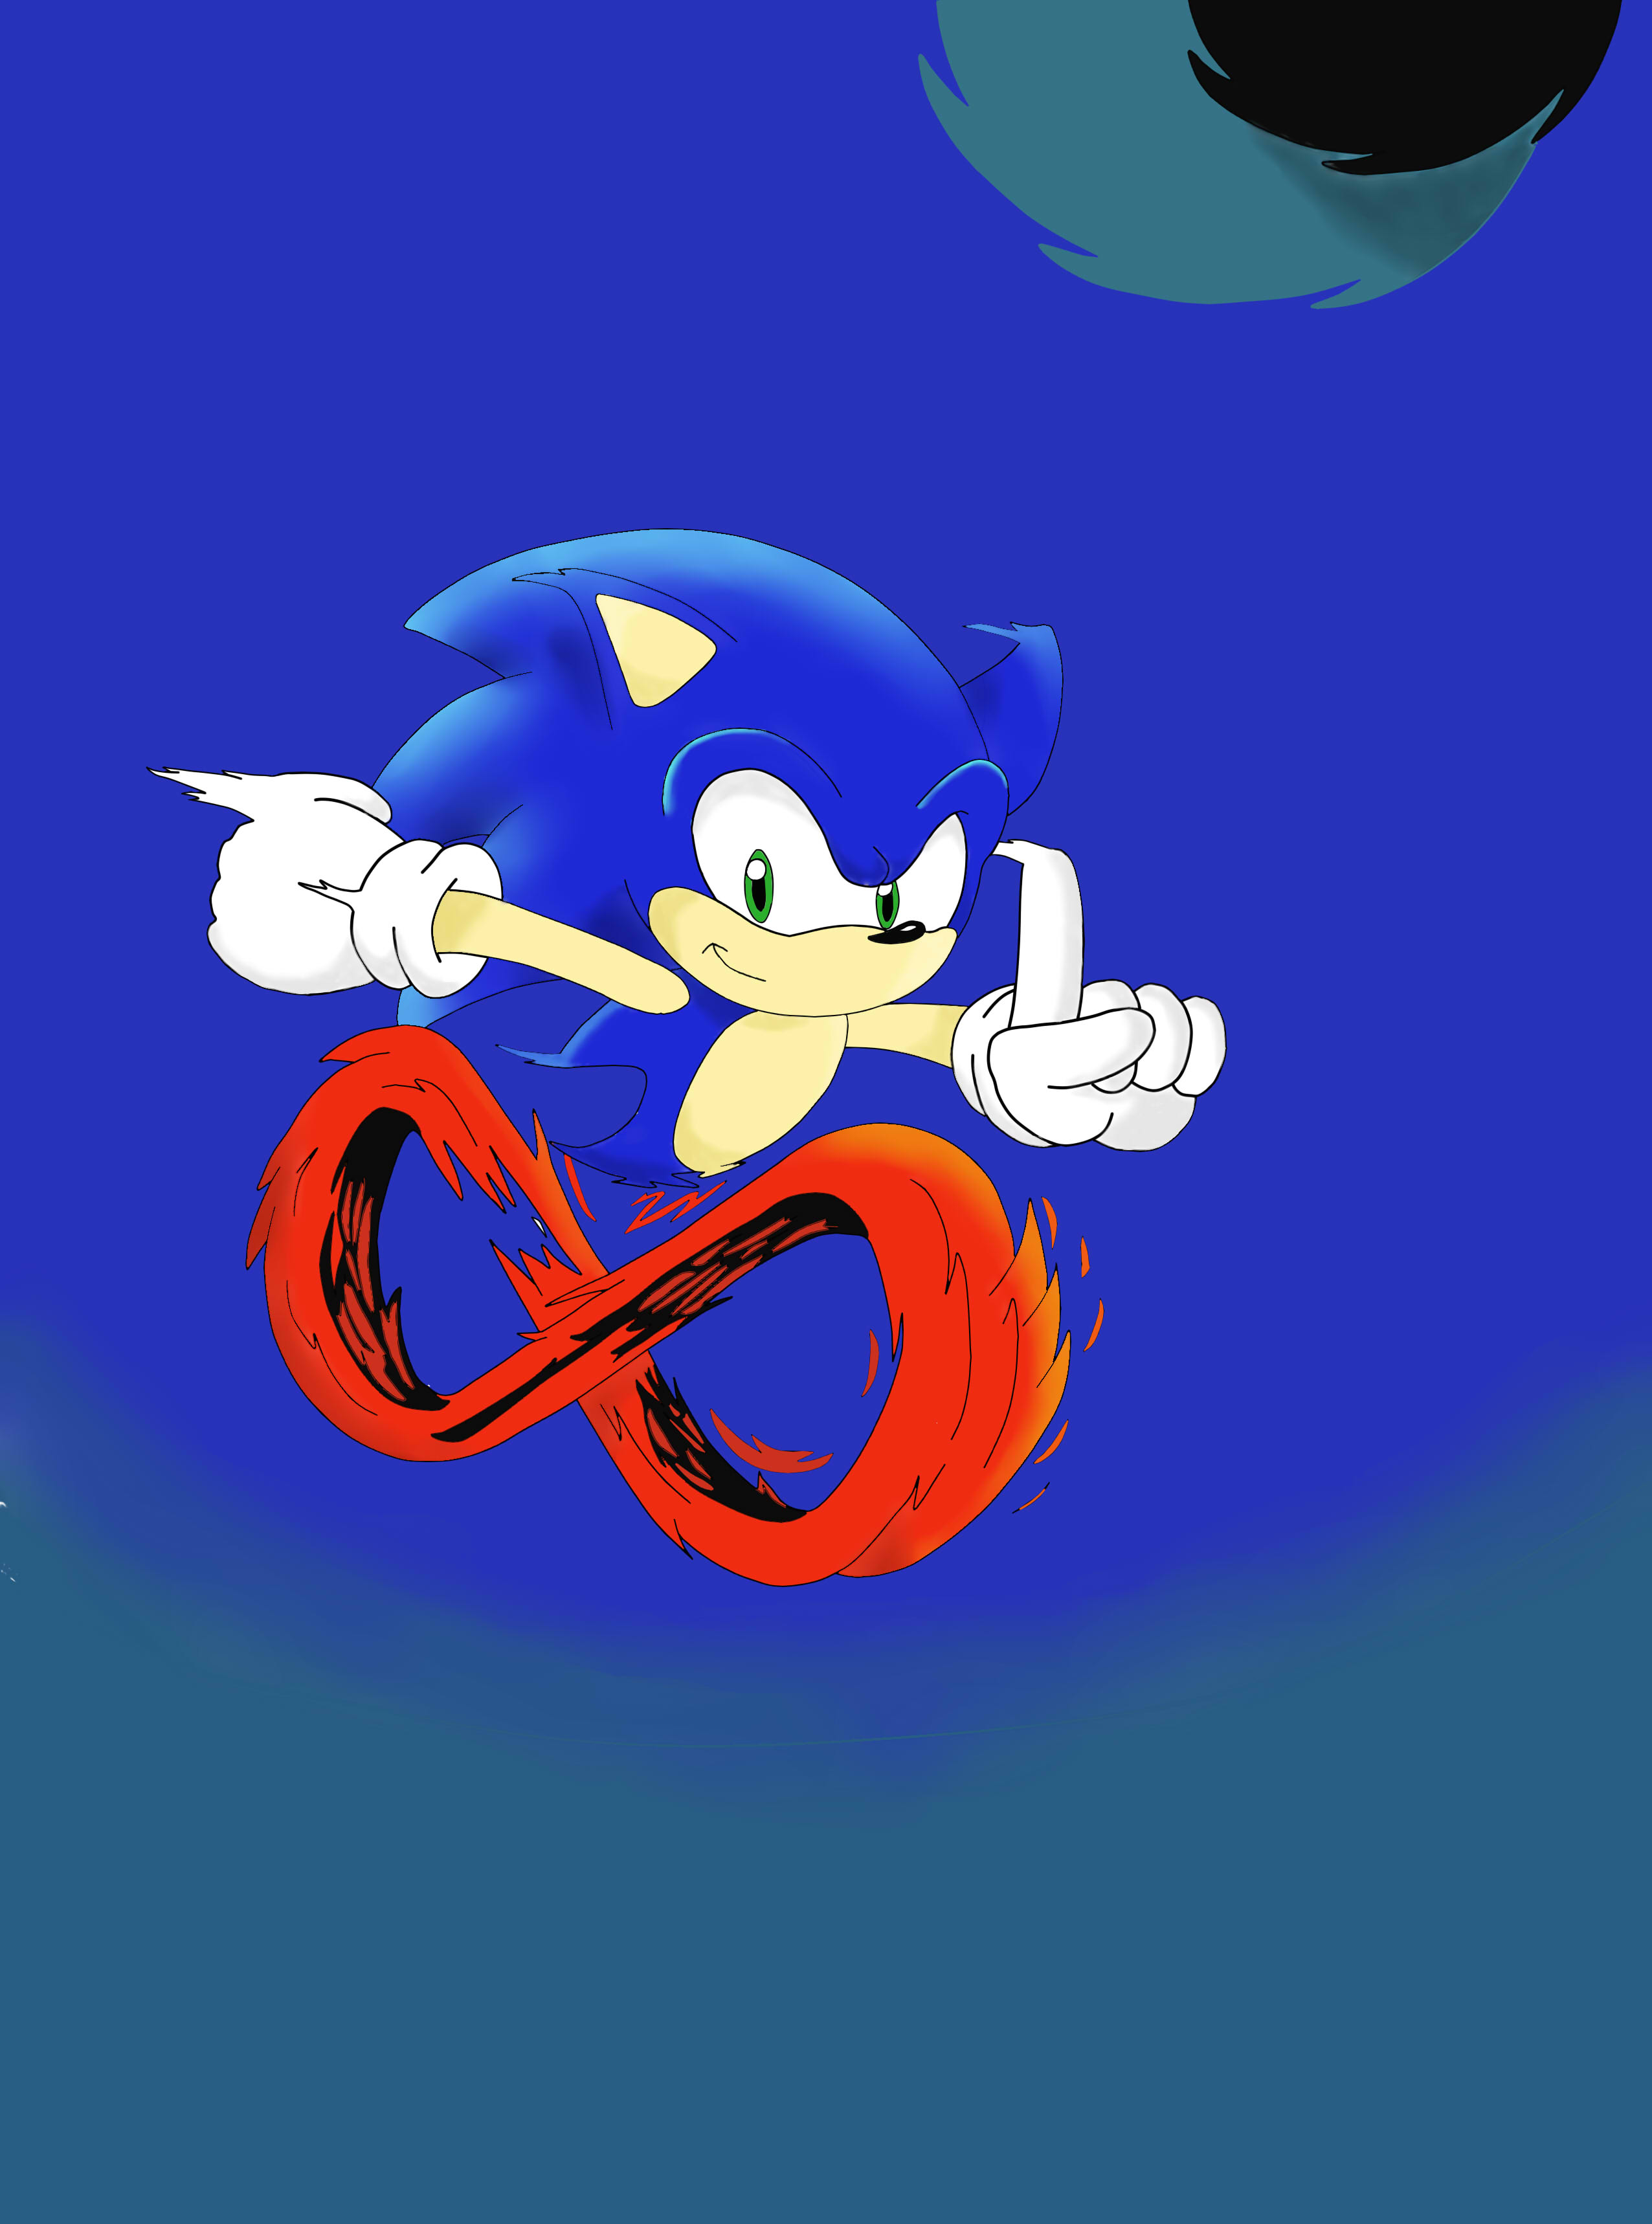 199 sonic the hedgehog - photo #28